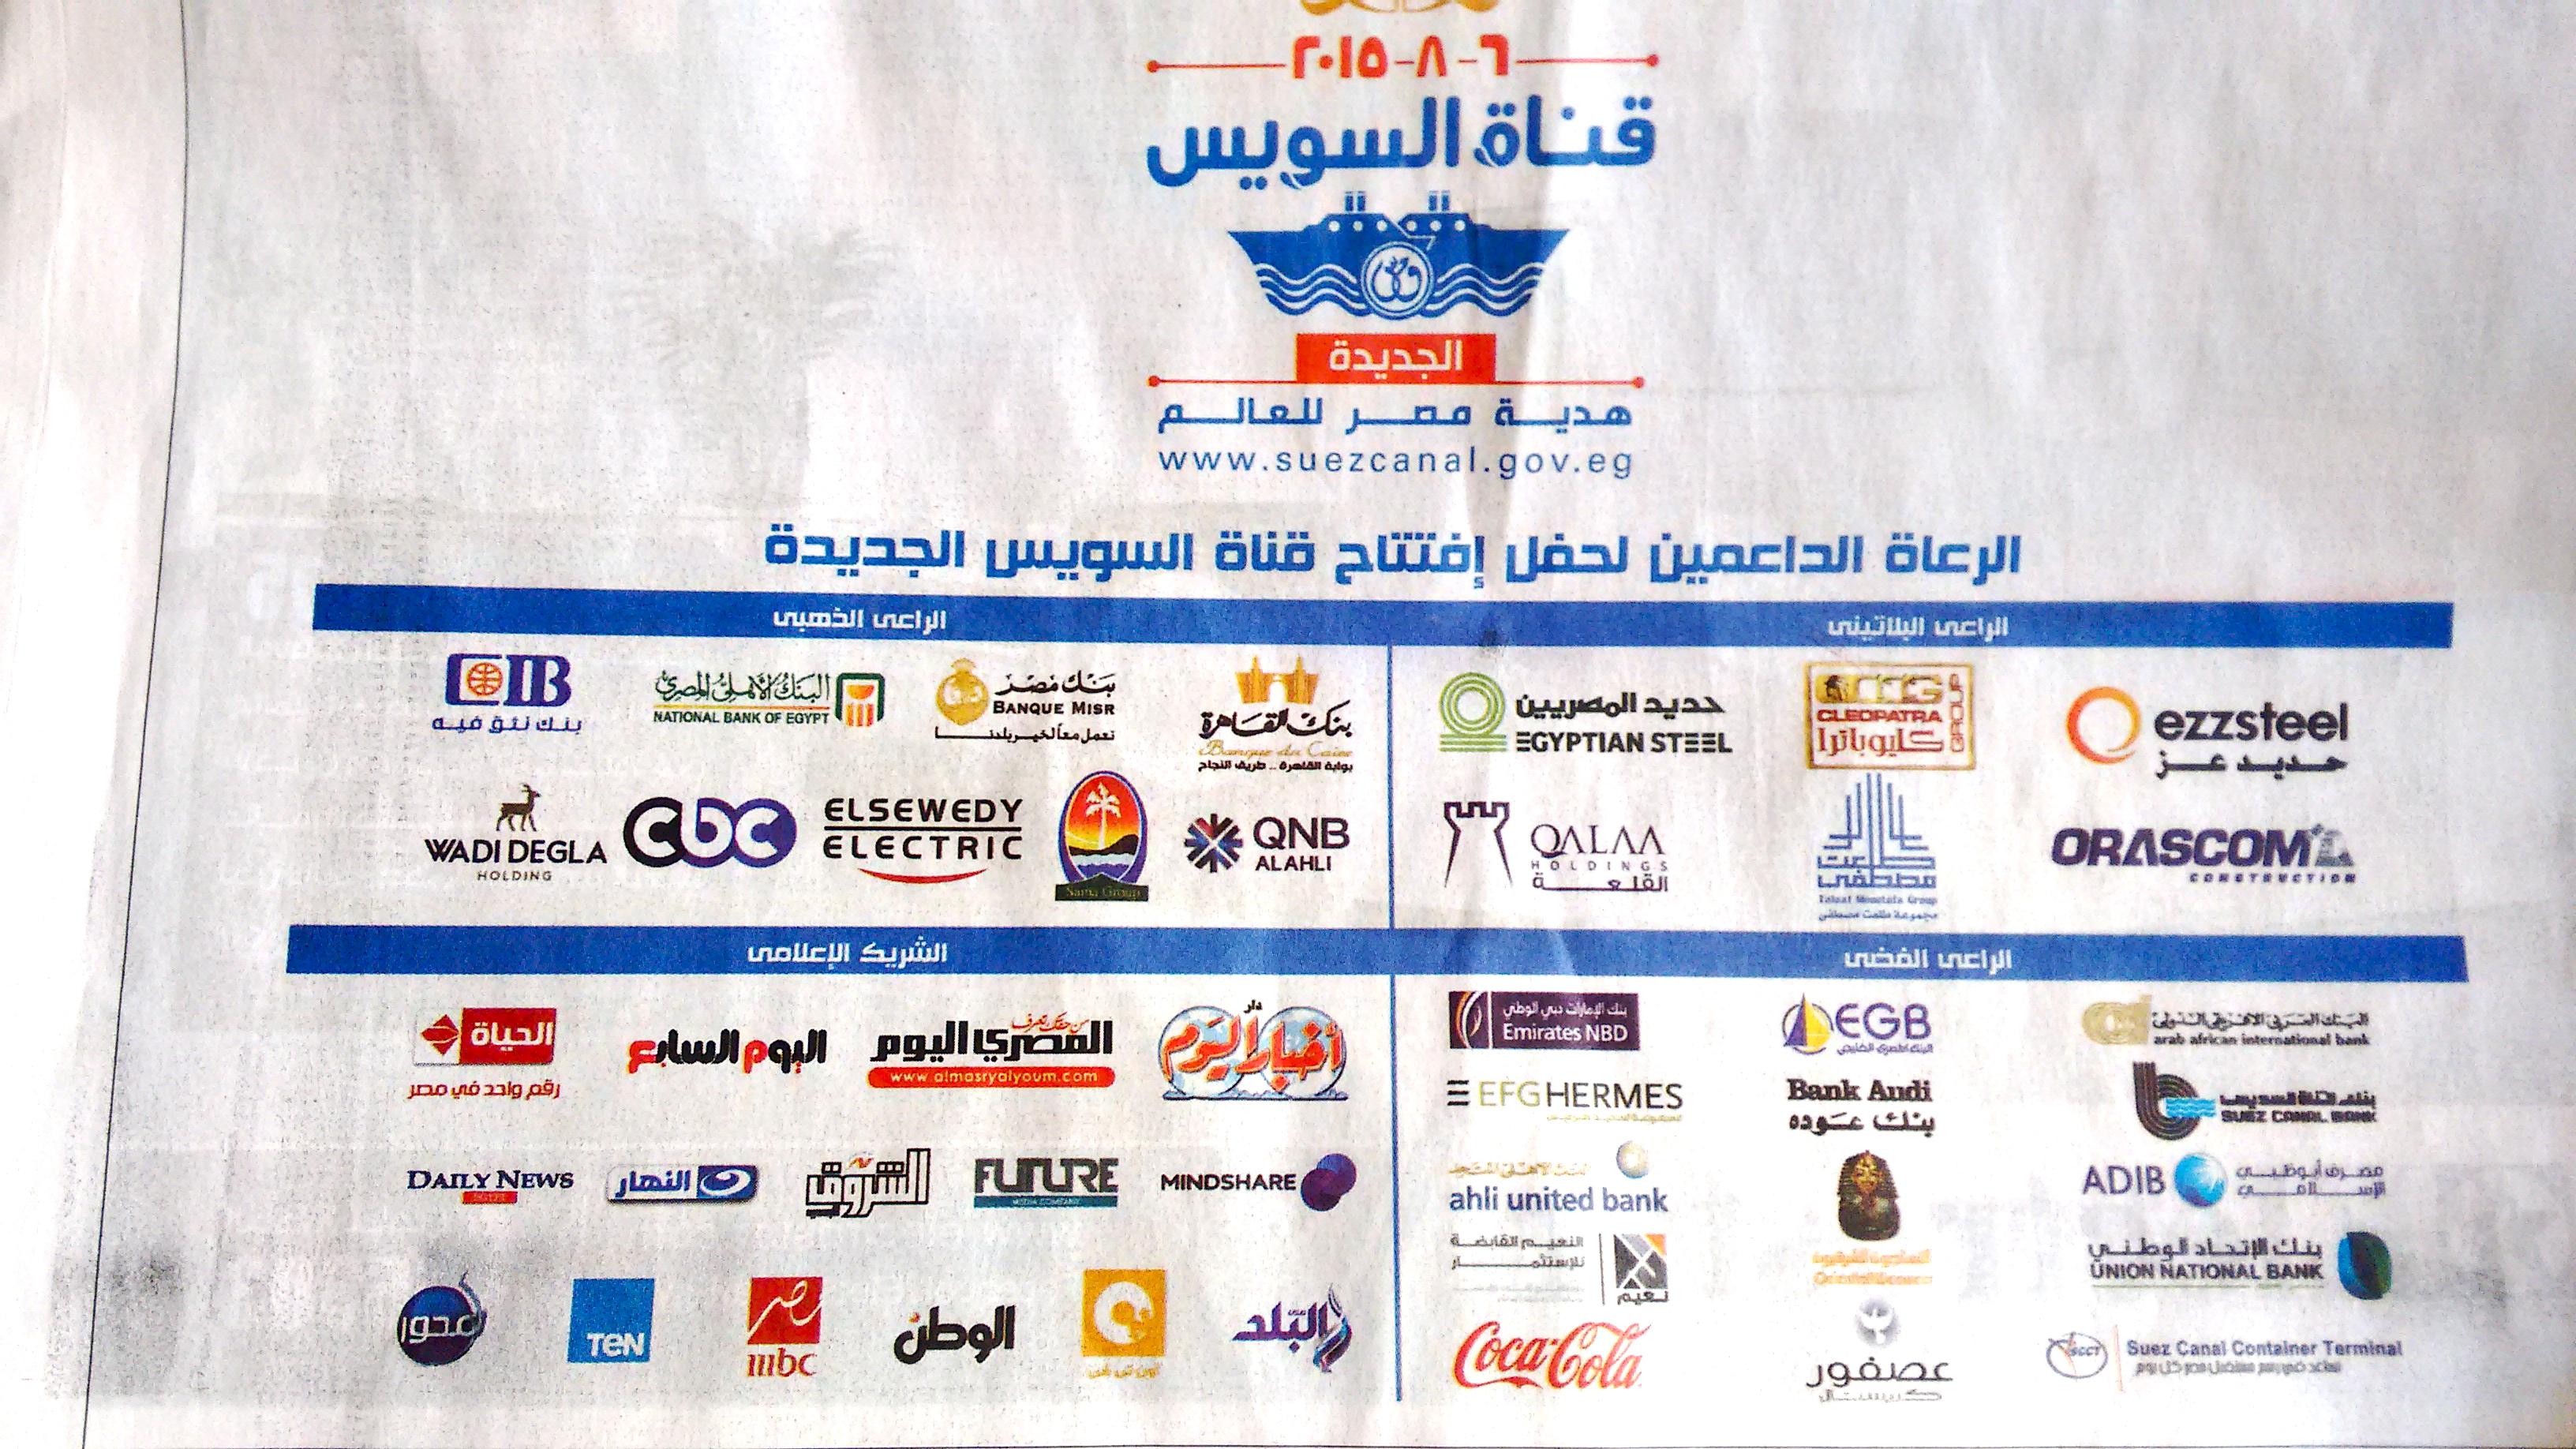 New Suez Canal sponsorship